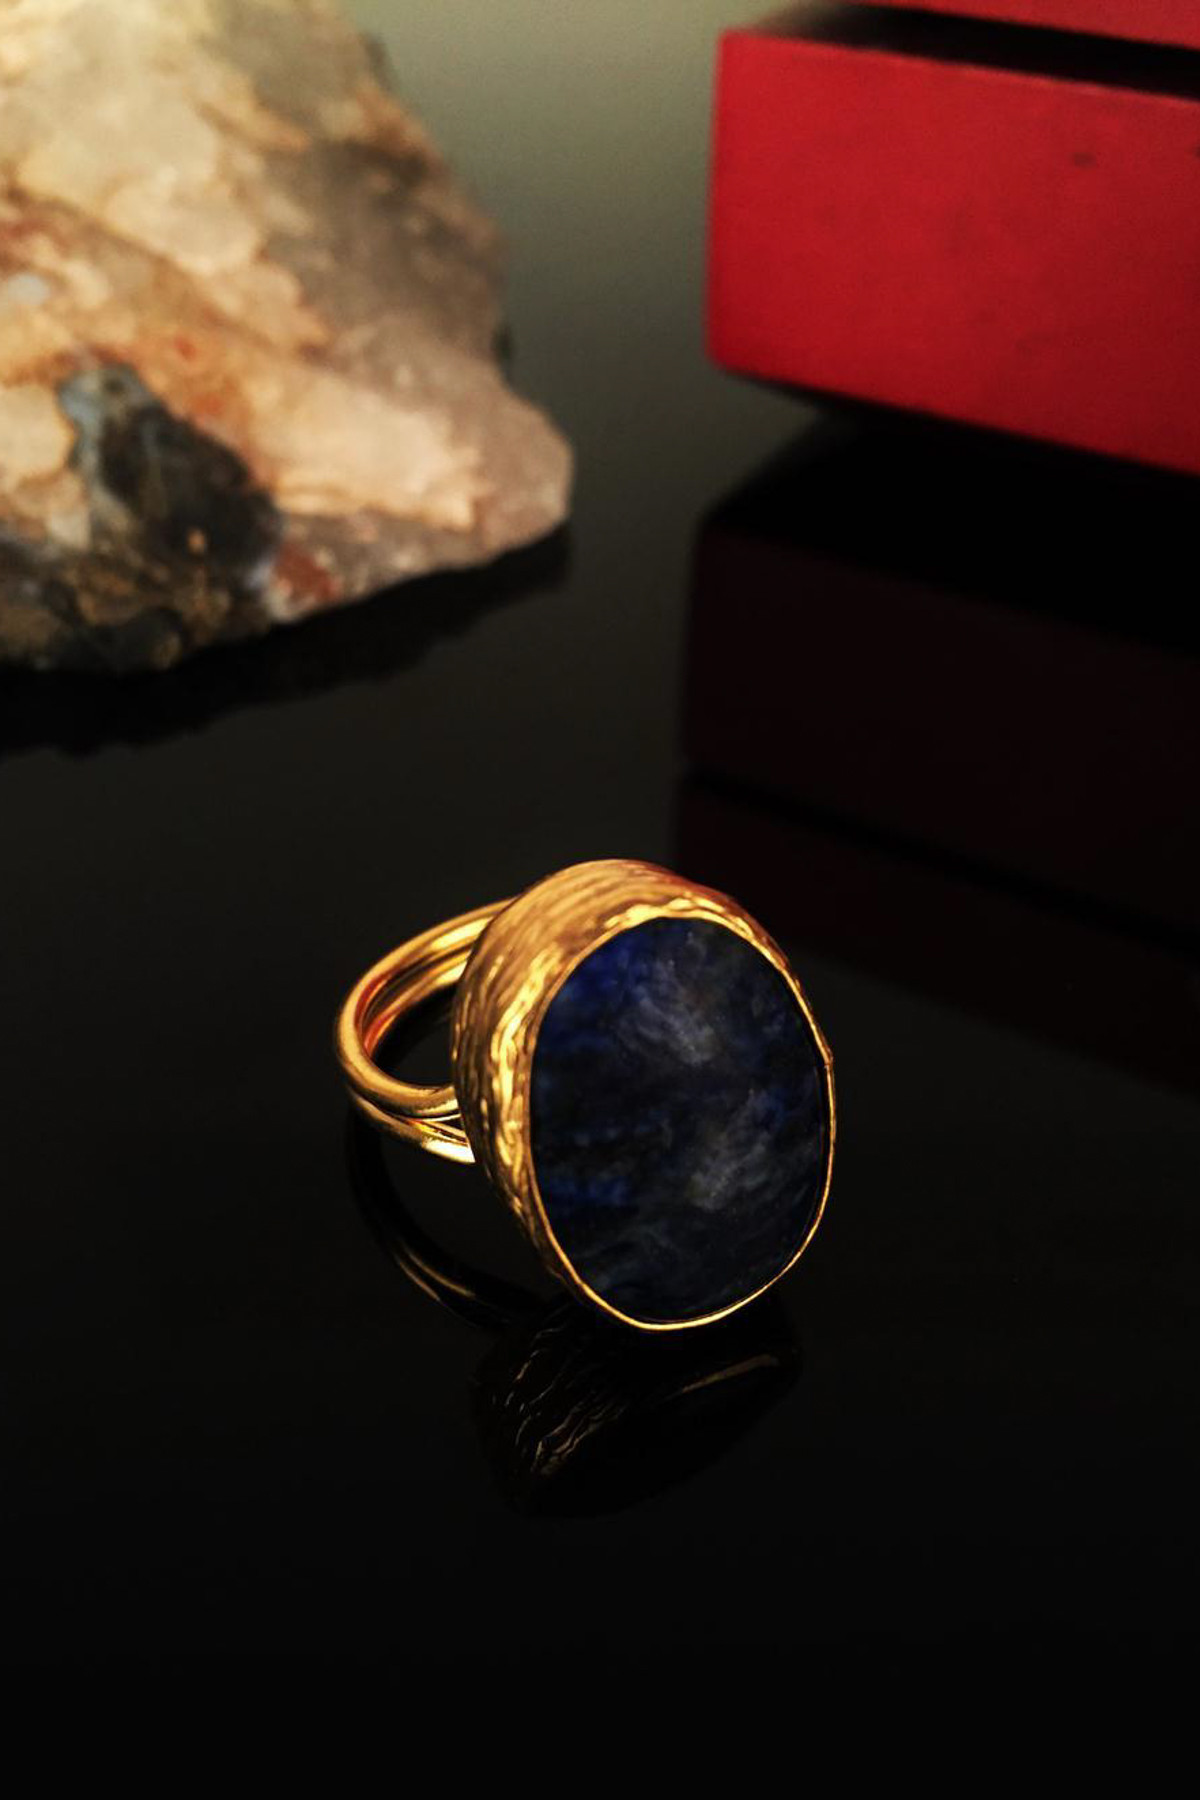 Dr. Stone Kadın Doğaltaş Lapis Lazuli Taşı Gold Kaplama Yüzük Krb140 1